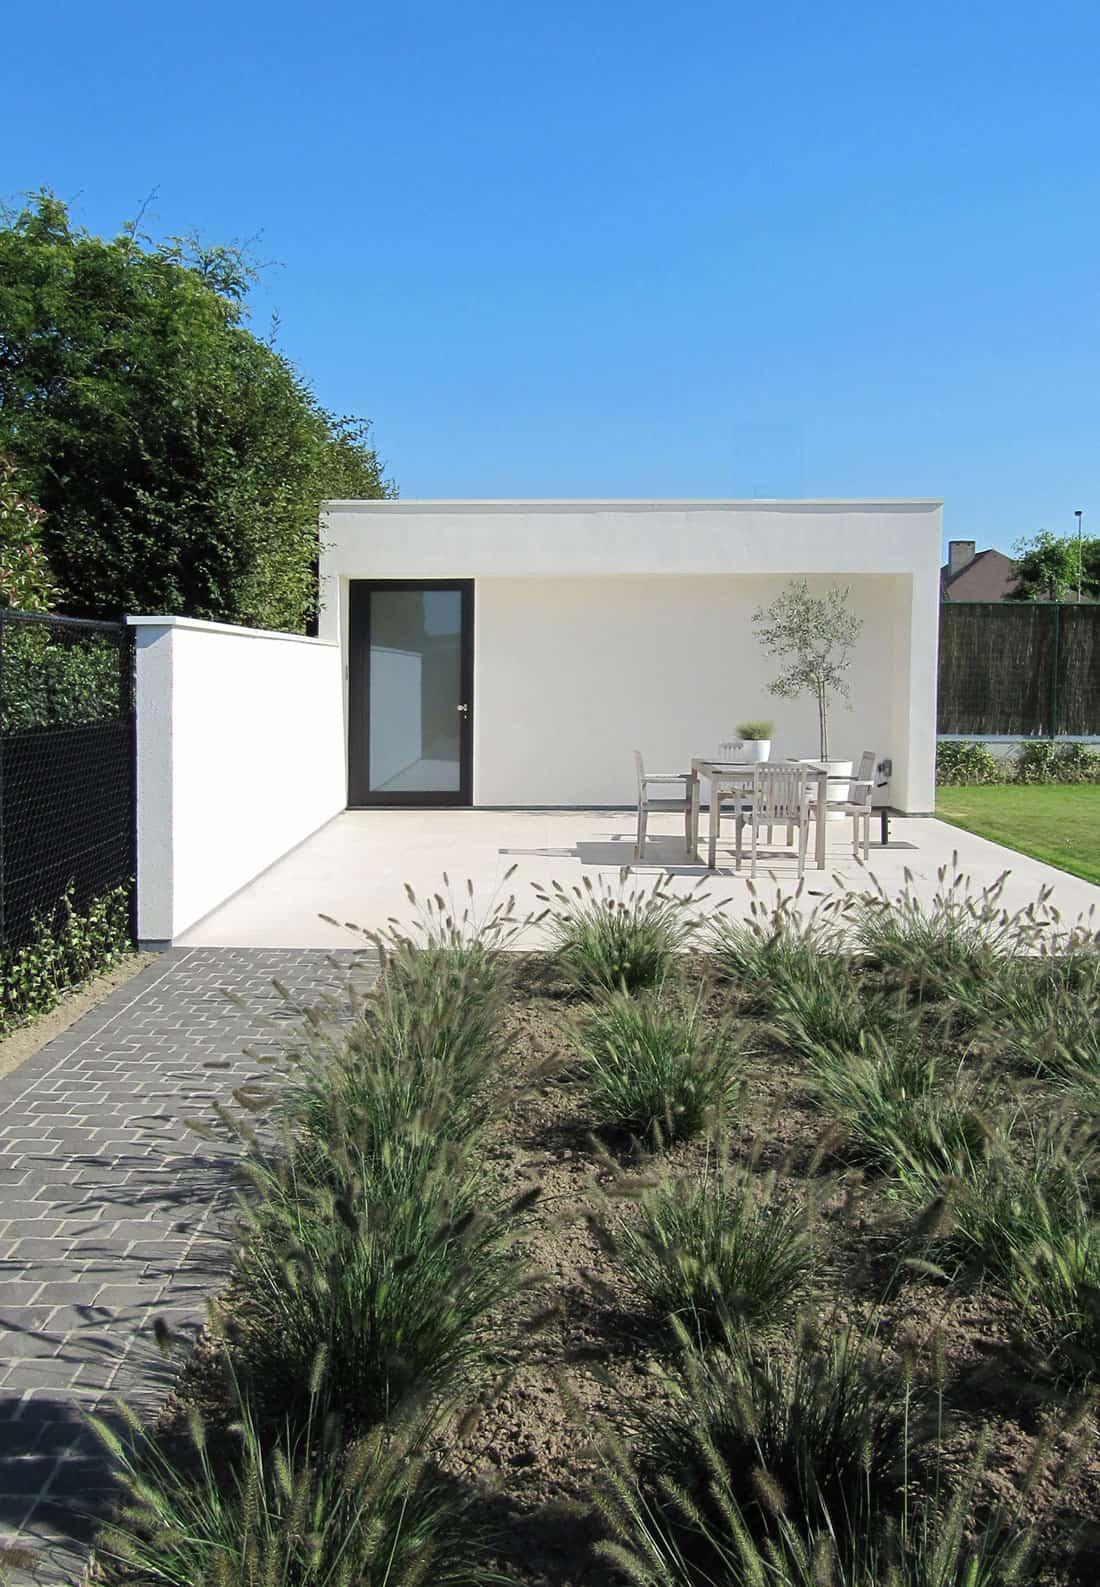 House VRT by DE JAEGHERE Architectuuratelier (6)